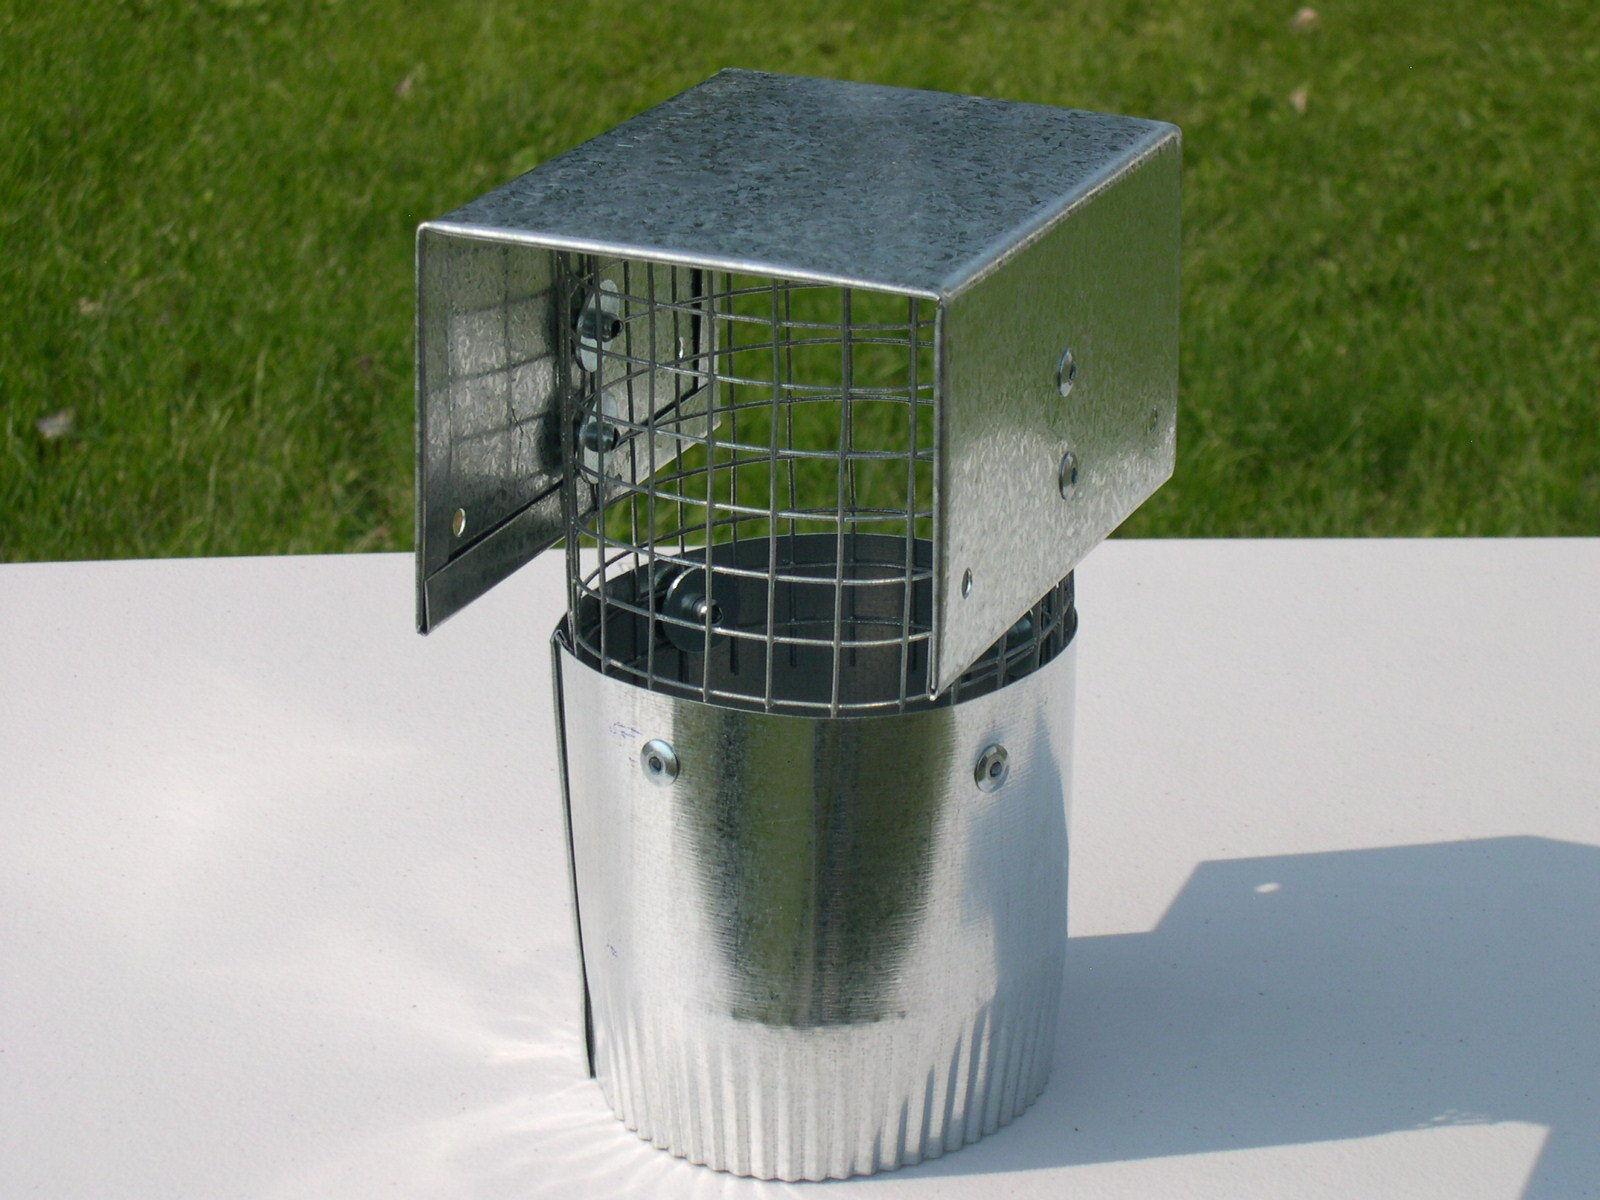 Spark Arrestor 3 inch for Wood Stove  - Riley Stoves  export outlet